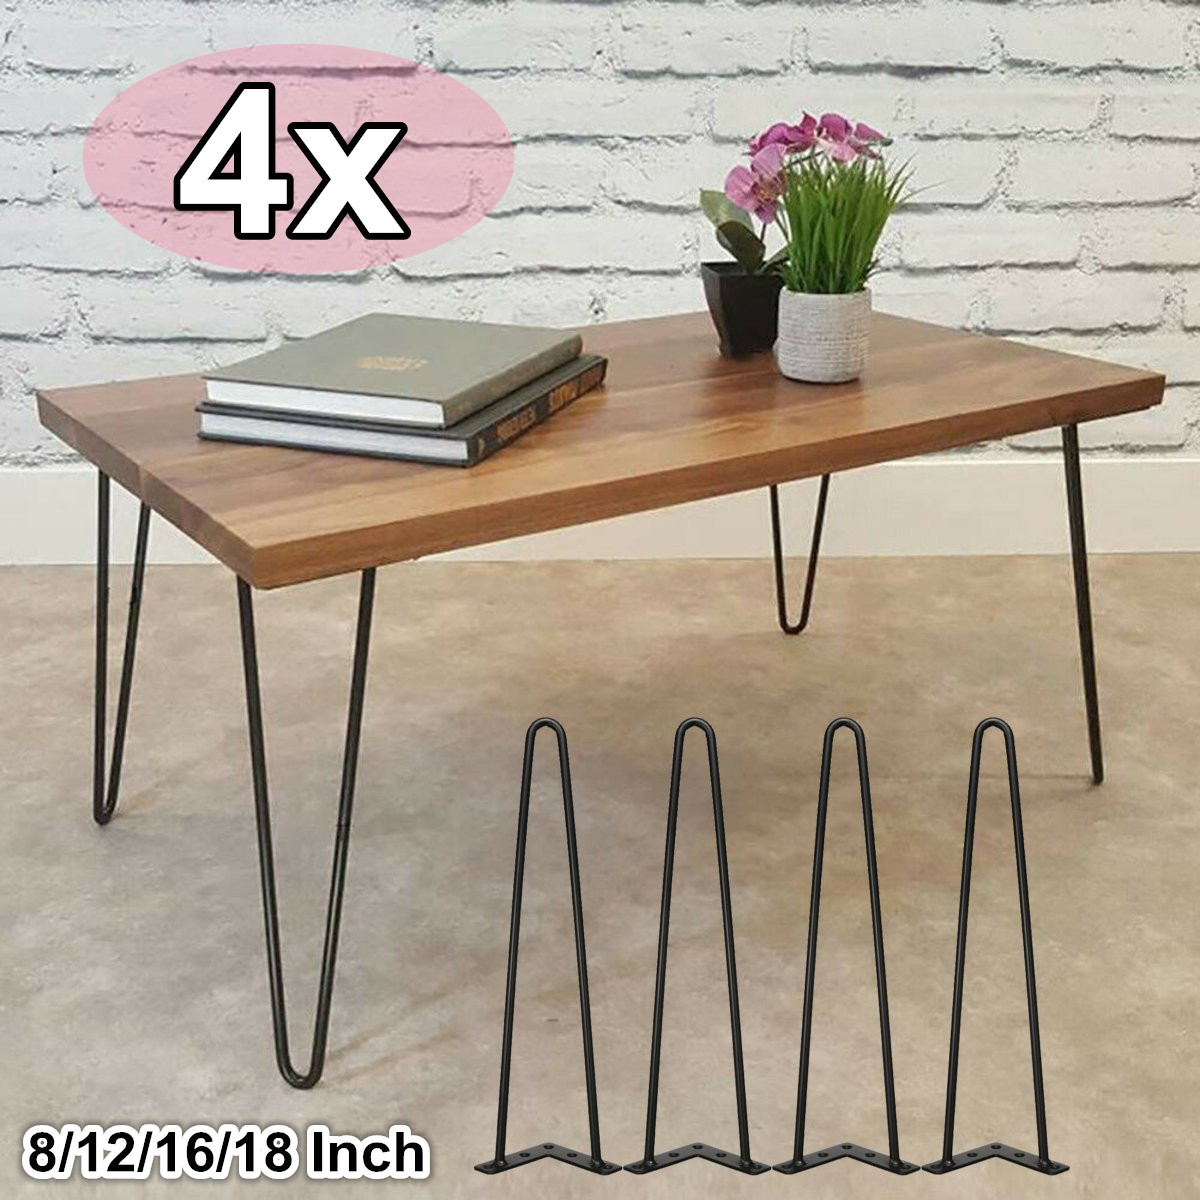 4Pcs U-shaped Metal Hairpin Table Desk Leg Bracket Solid Iron Furniture Support Leg Sofa Cabinet Chairs DIY Hardware 8-18 Inch